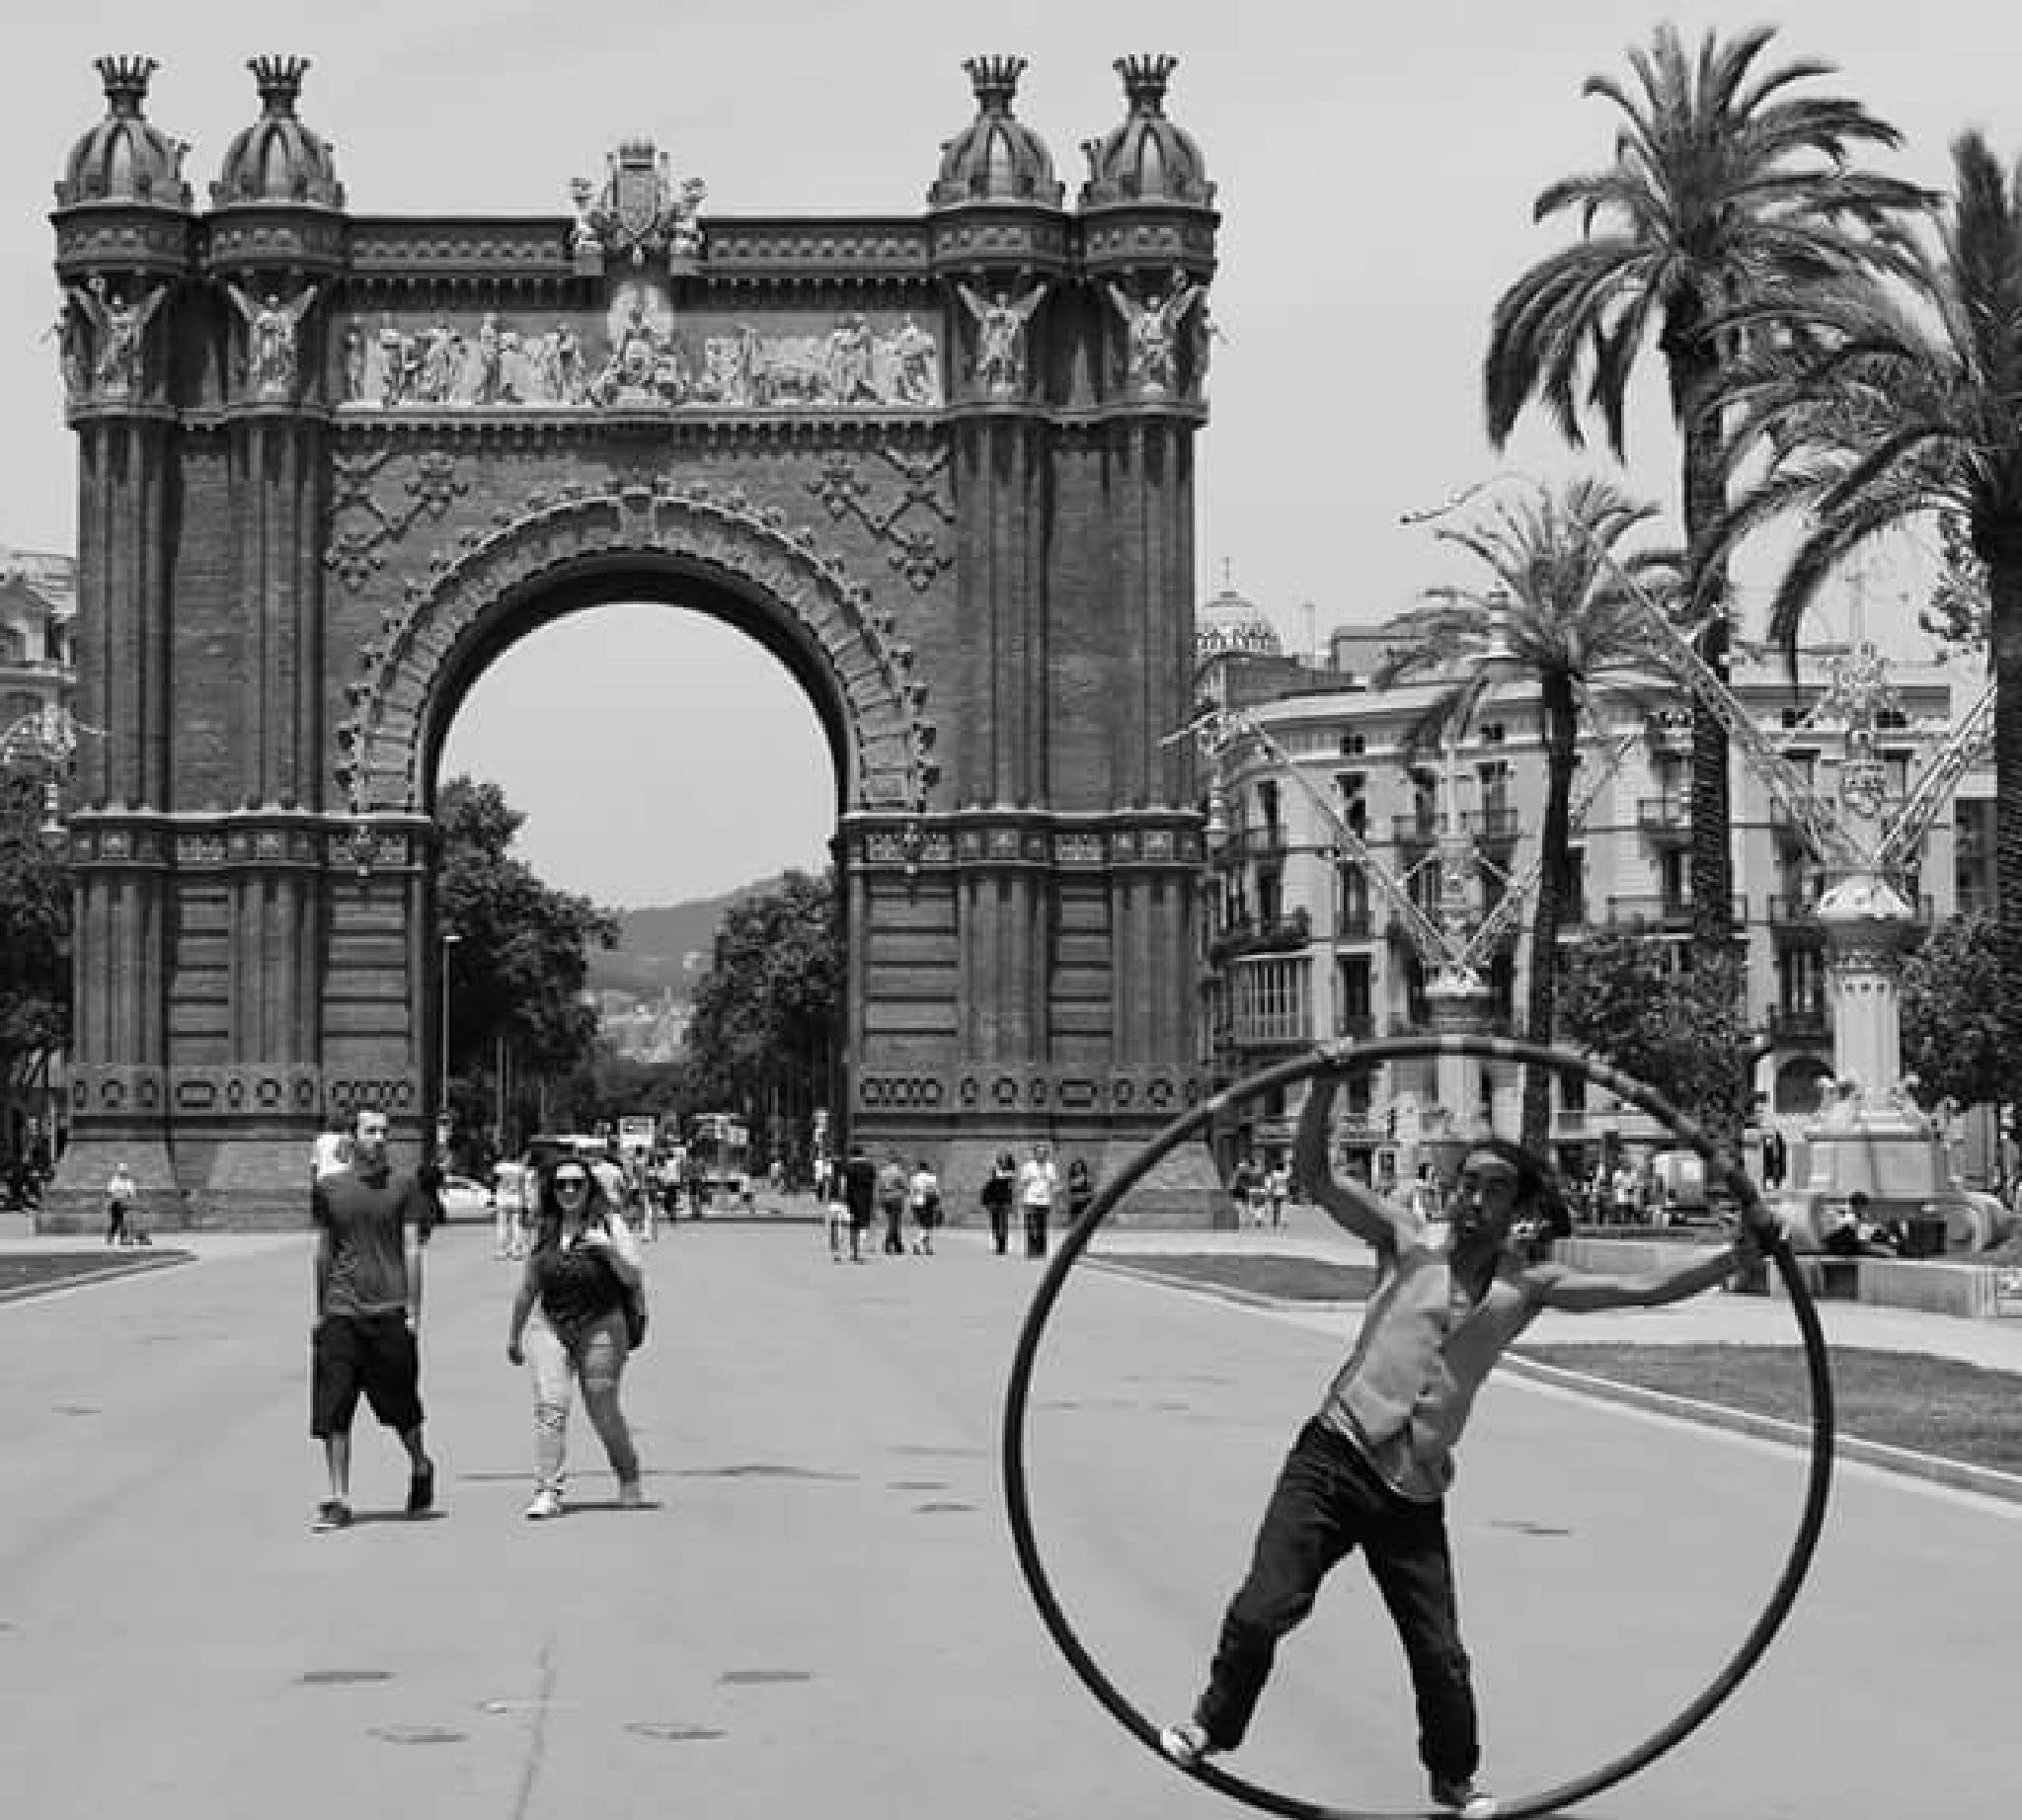 Barcelona by thierrylorenzo